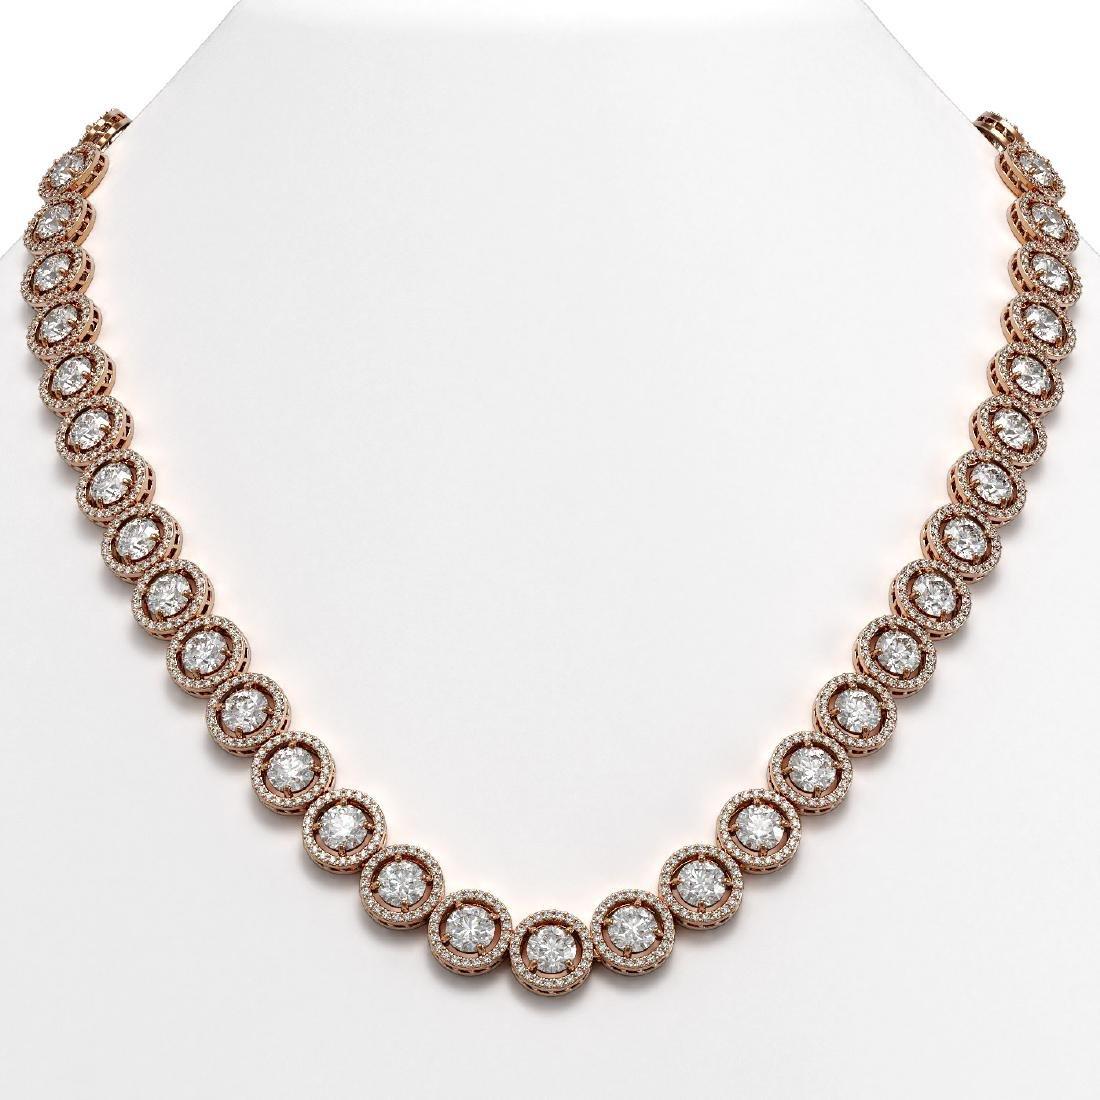 35.32 CTW Diamond Designer Necklace 18K Rose Gold